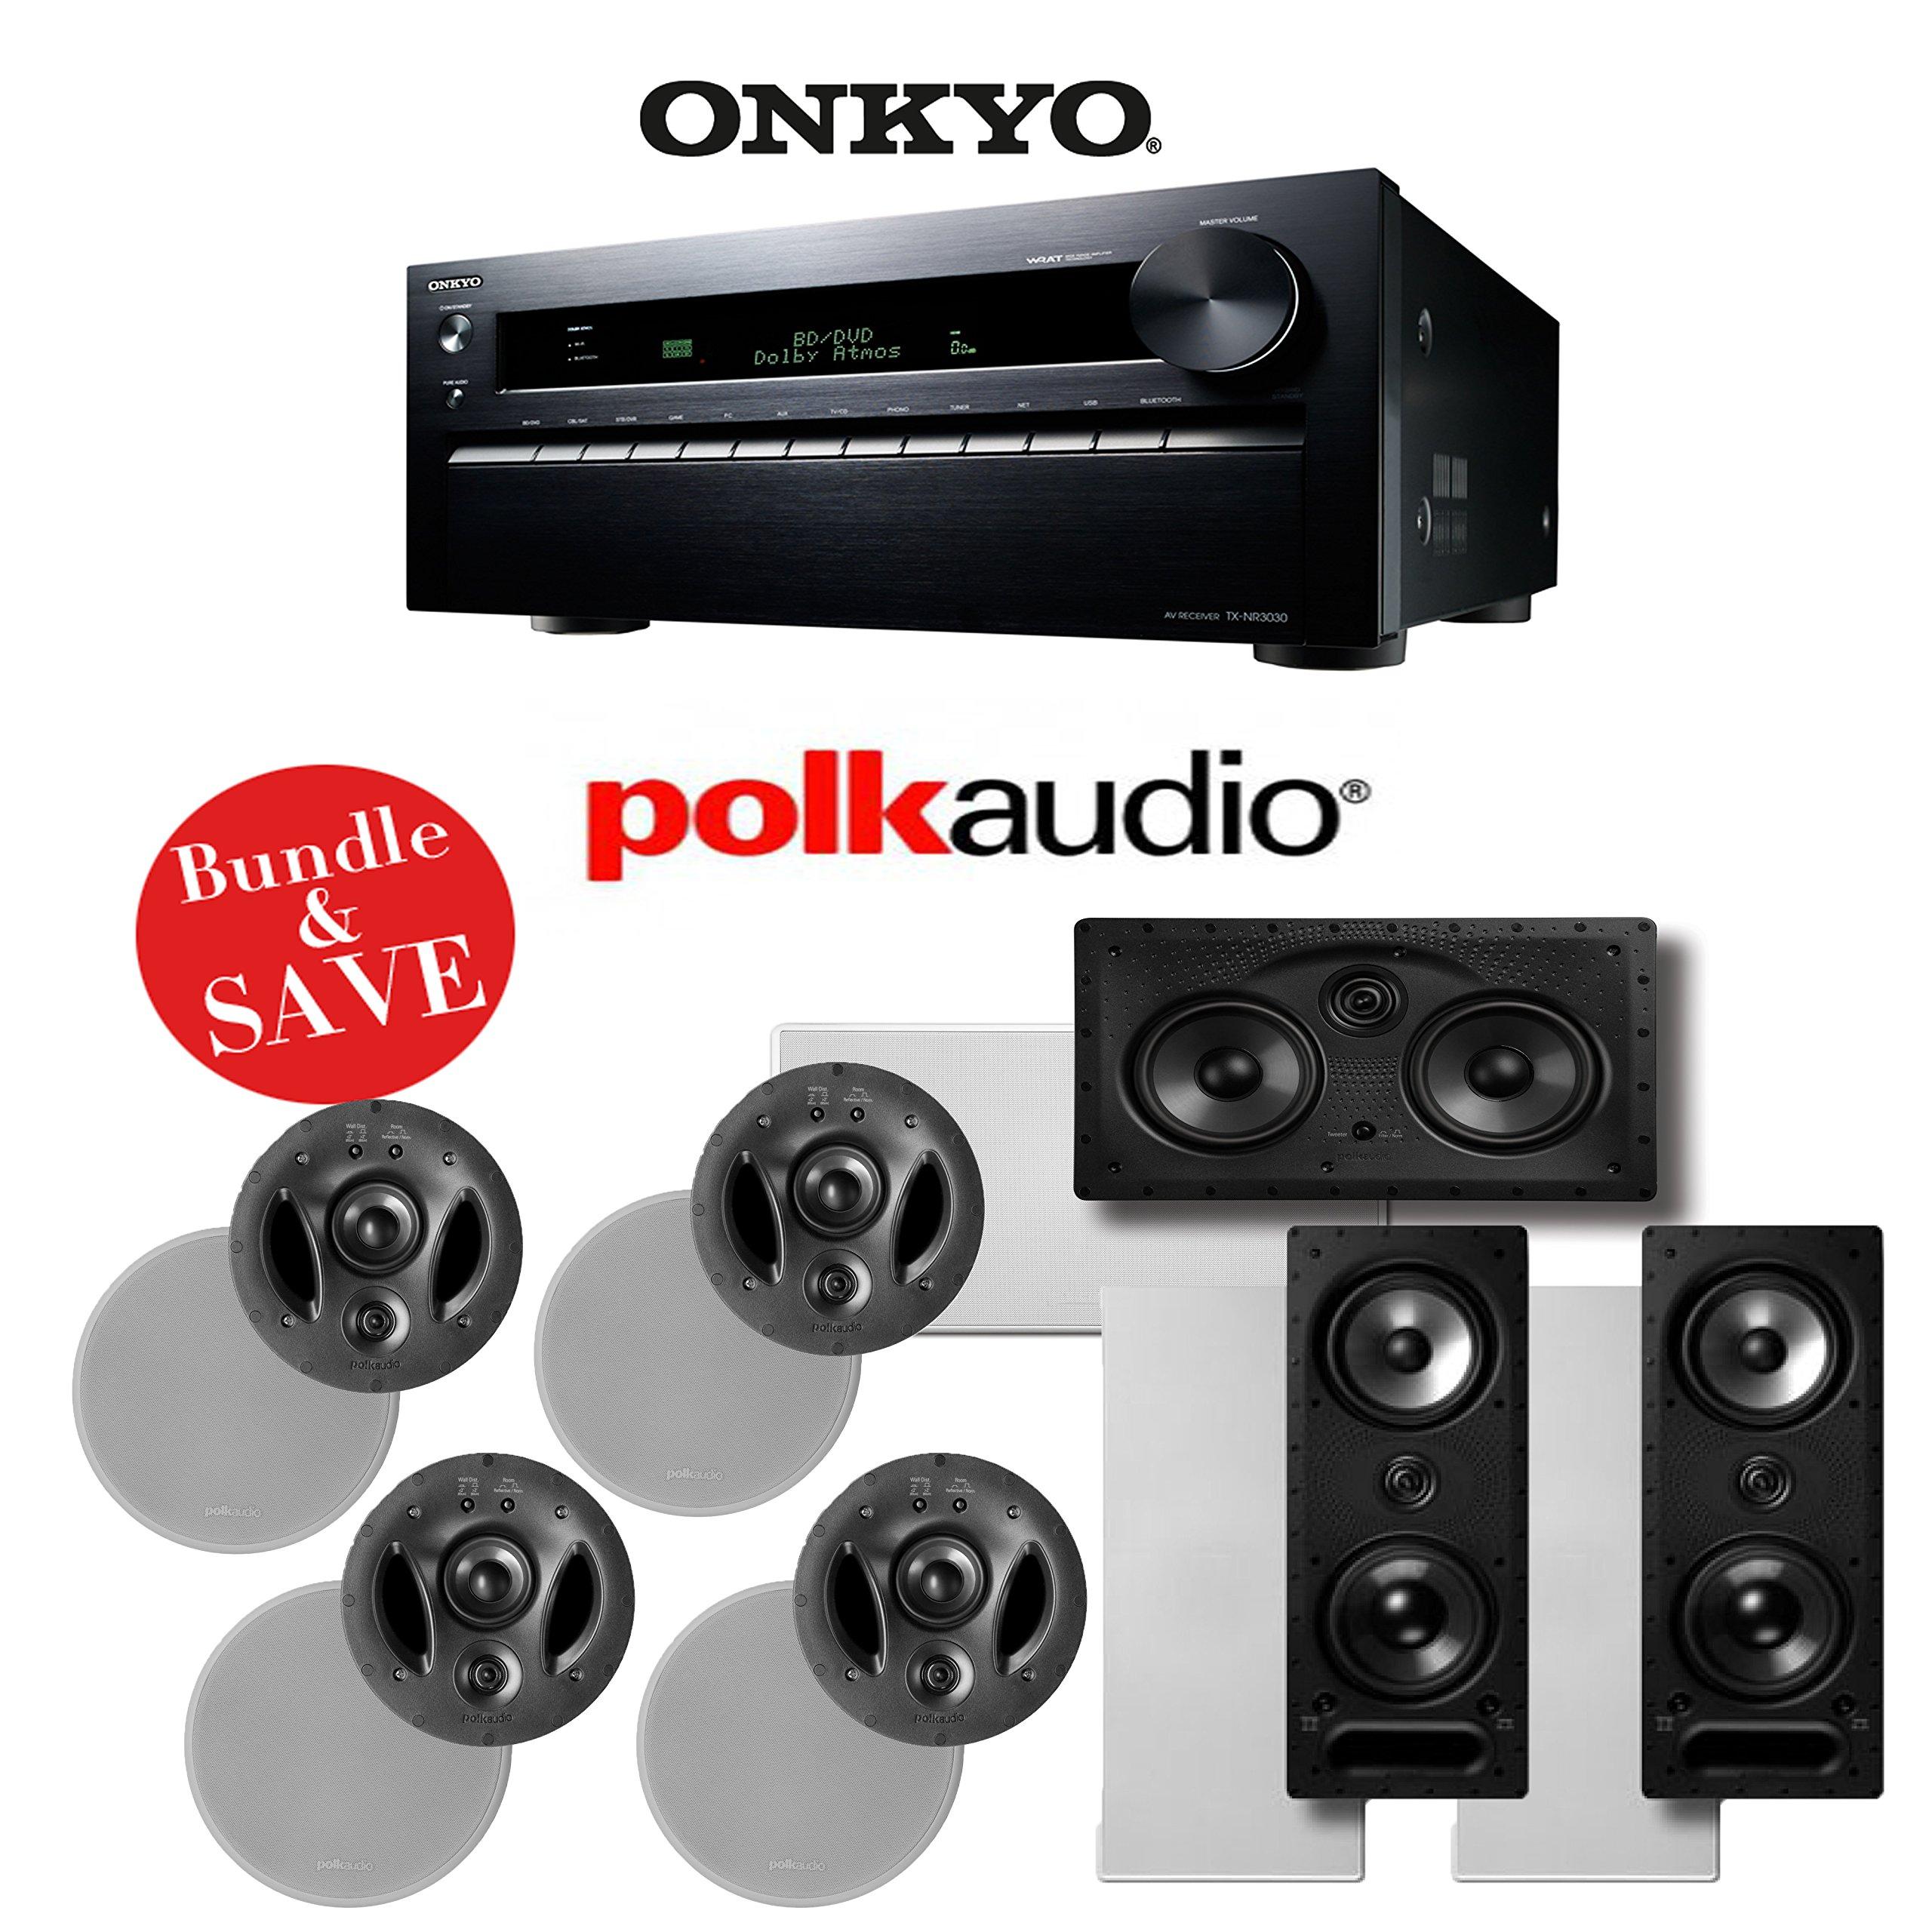 Onkyo TX-NR3030 11.2-Ch Networking A/V Receiver + (4) Polk Audio 900-LS In-Ceiling Speakers + (2) Polk Audio 265-LS In-Wall Speakers + (1) Polk Audio 255C-LS In-Wall Center Speaker - Bundle